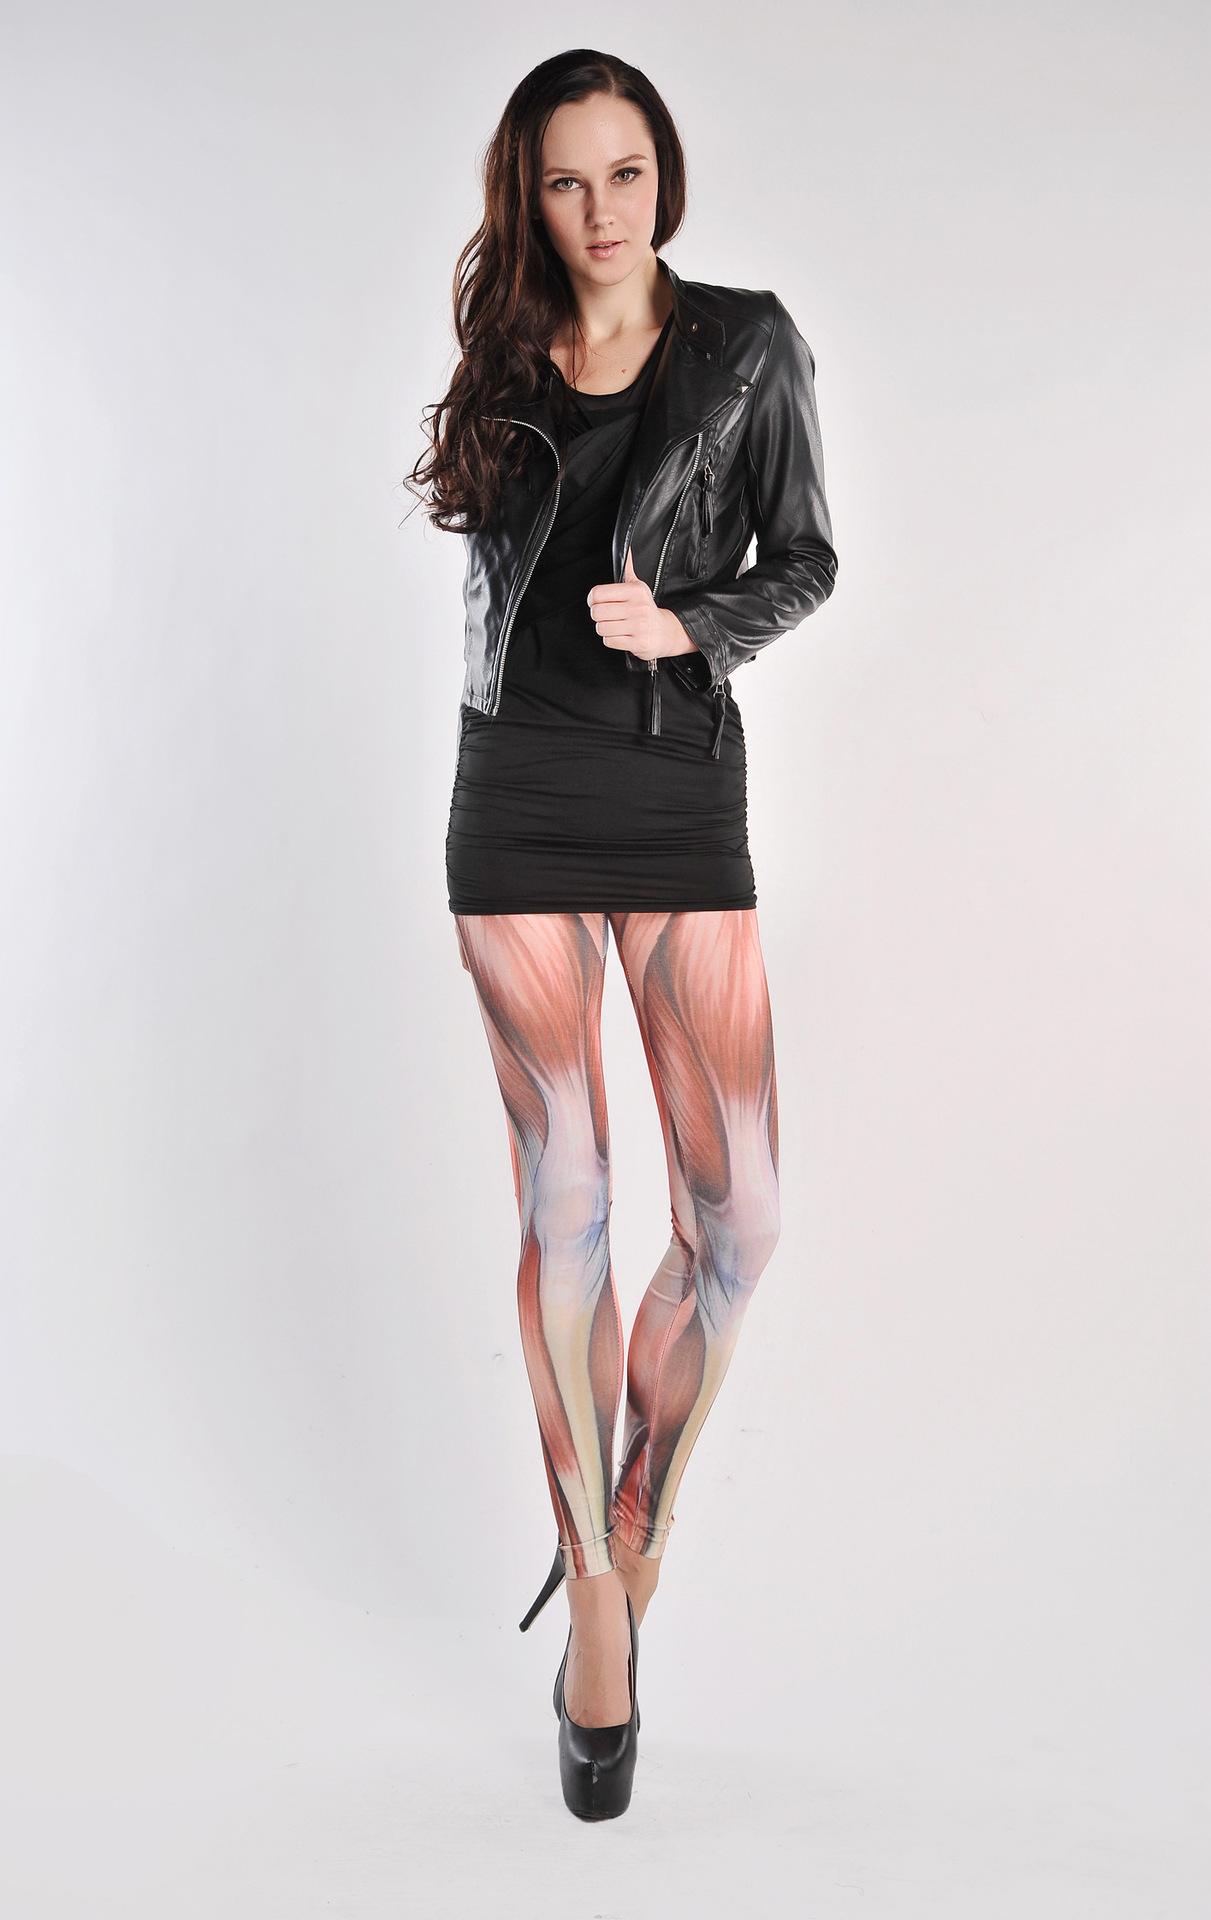 Mens Business Casual Fashion 2013